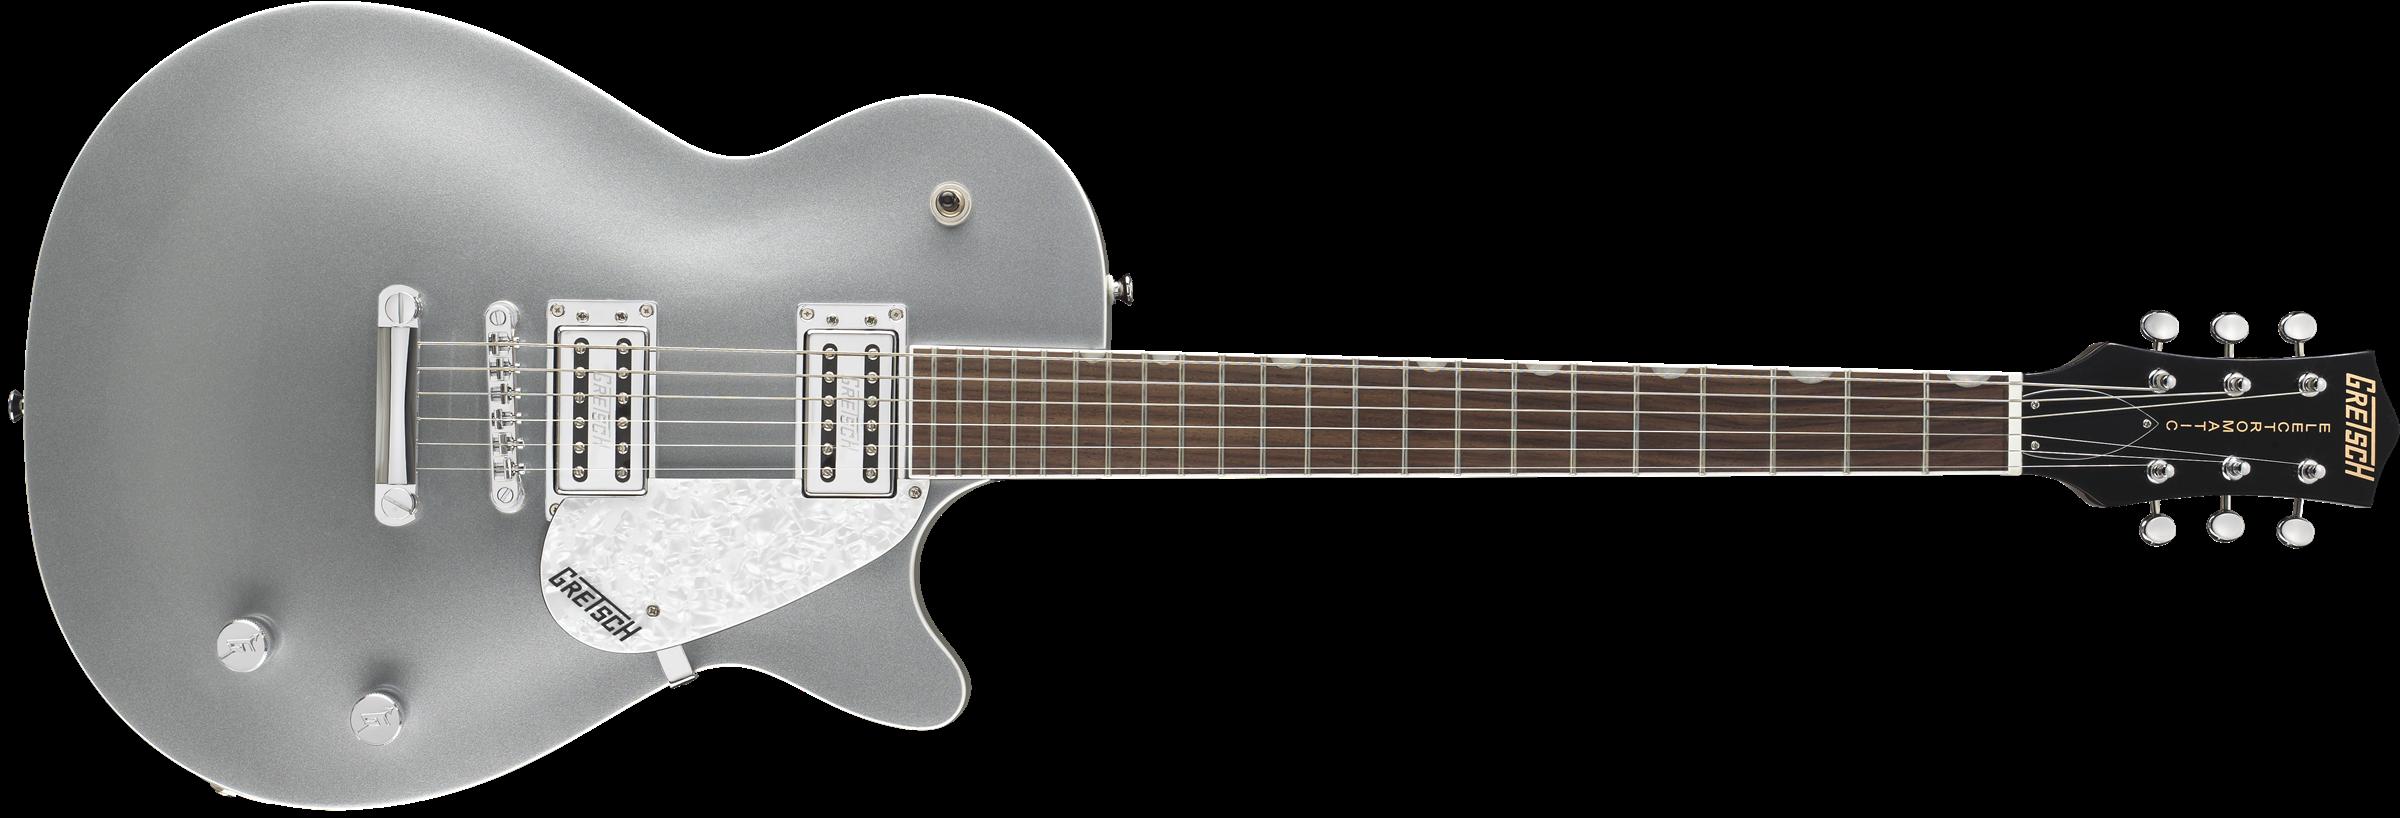 Gretsch G5425 Electromatic Jet Club - Silver